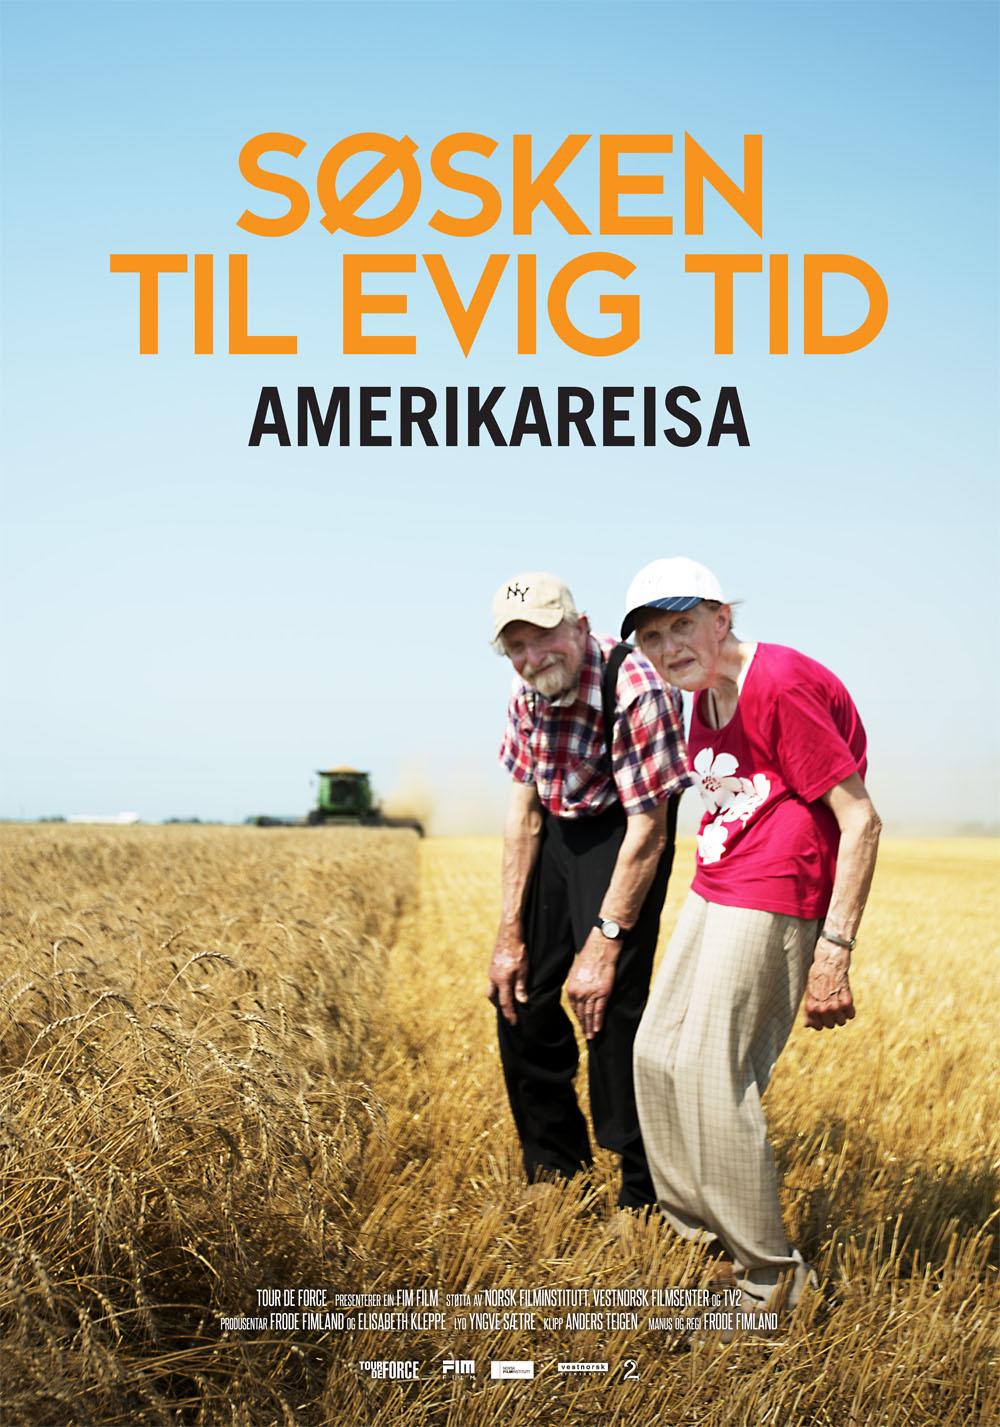 «Søsken til evig tid: Amerikareisa» – plakat